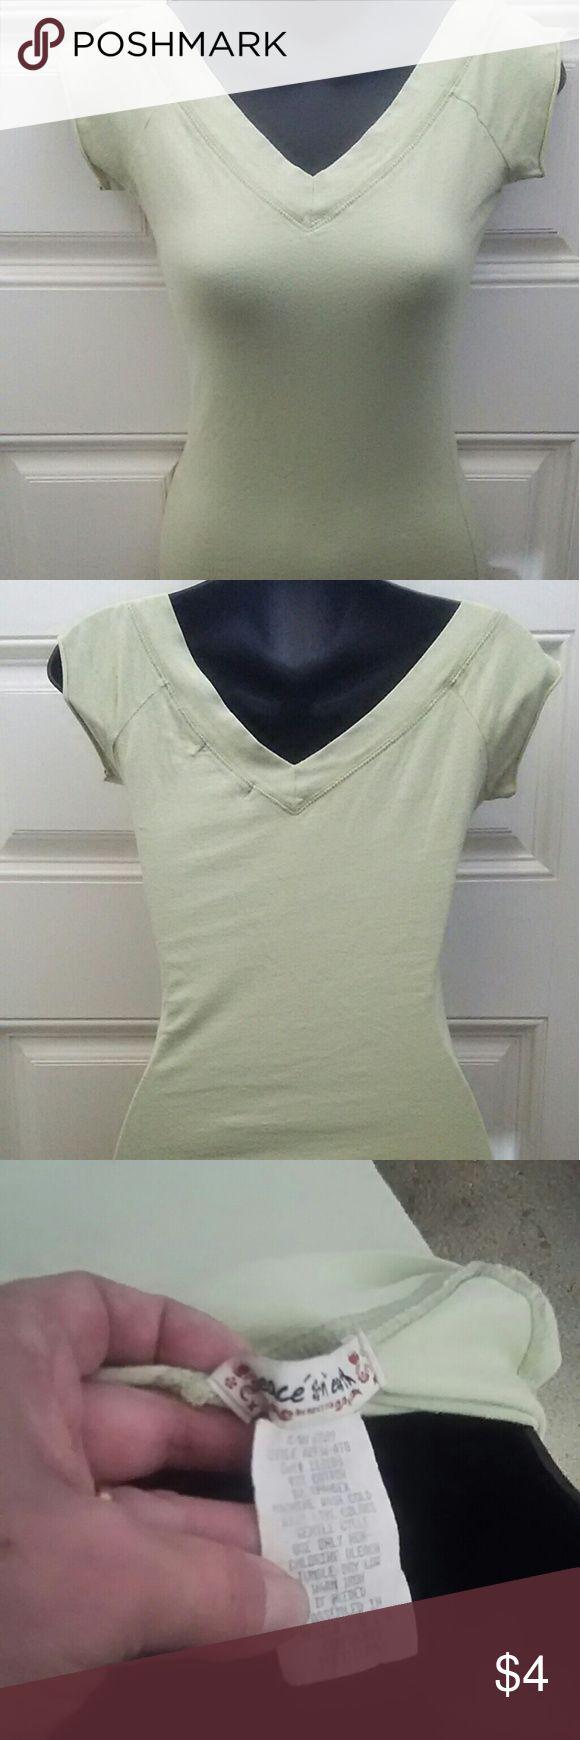 Light Lime Green V-Neck Short Sleeve T-Shirt / Top Light Lime Green v-neck short sleeve t-shirt / top Peace On Earth Tops Tees - Short Sleeve